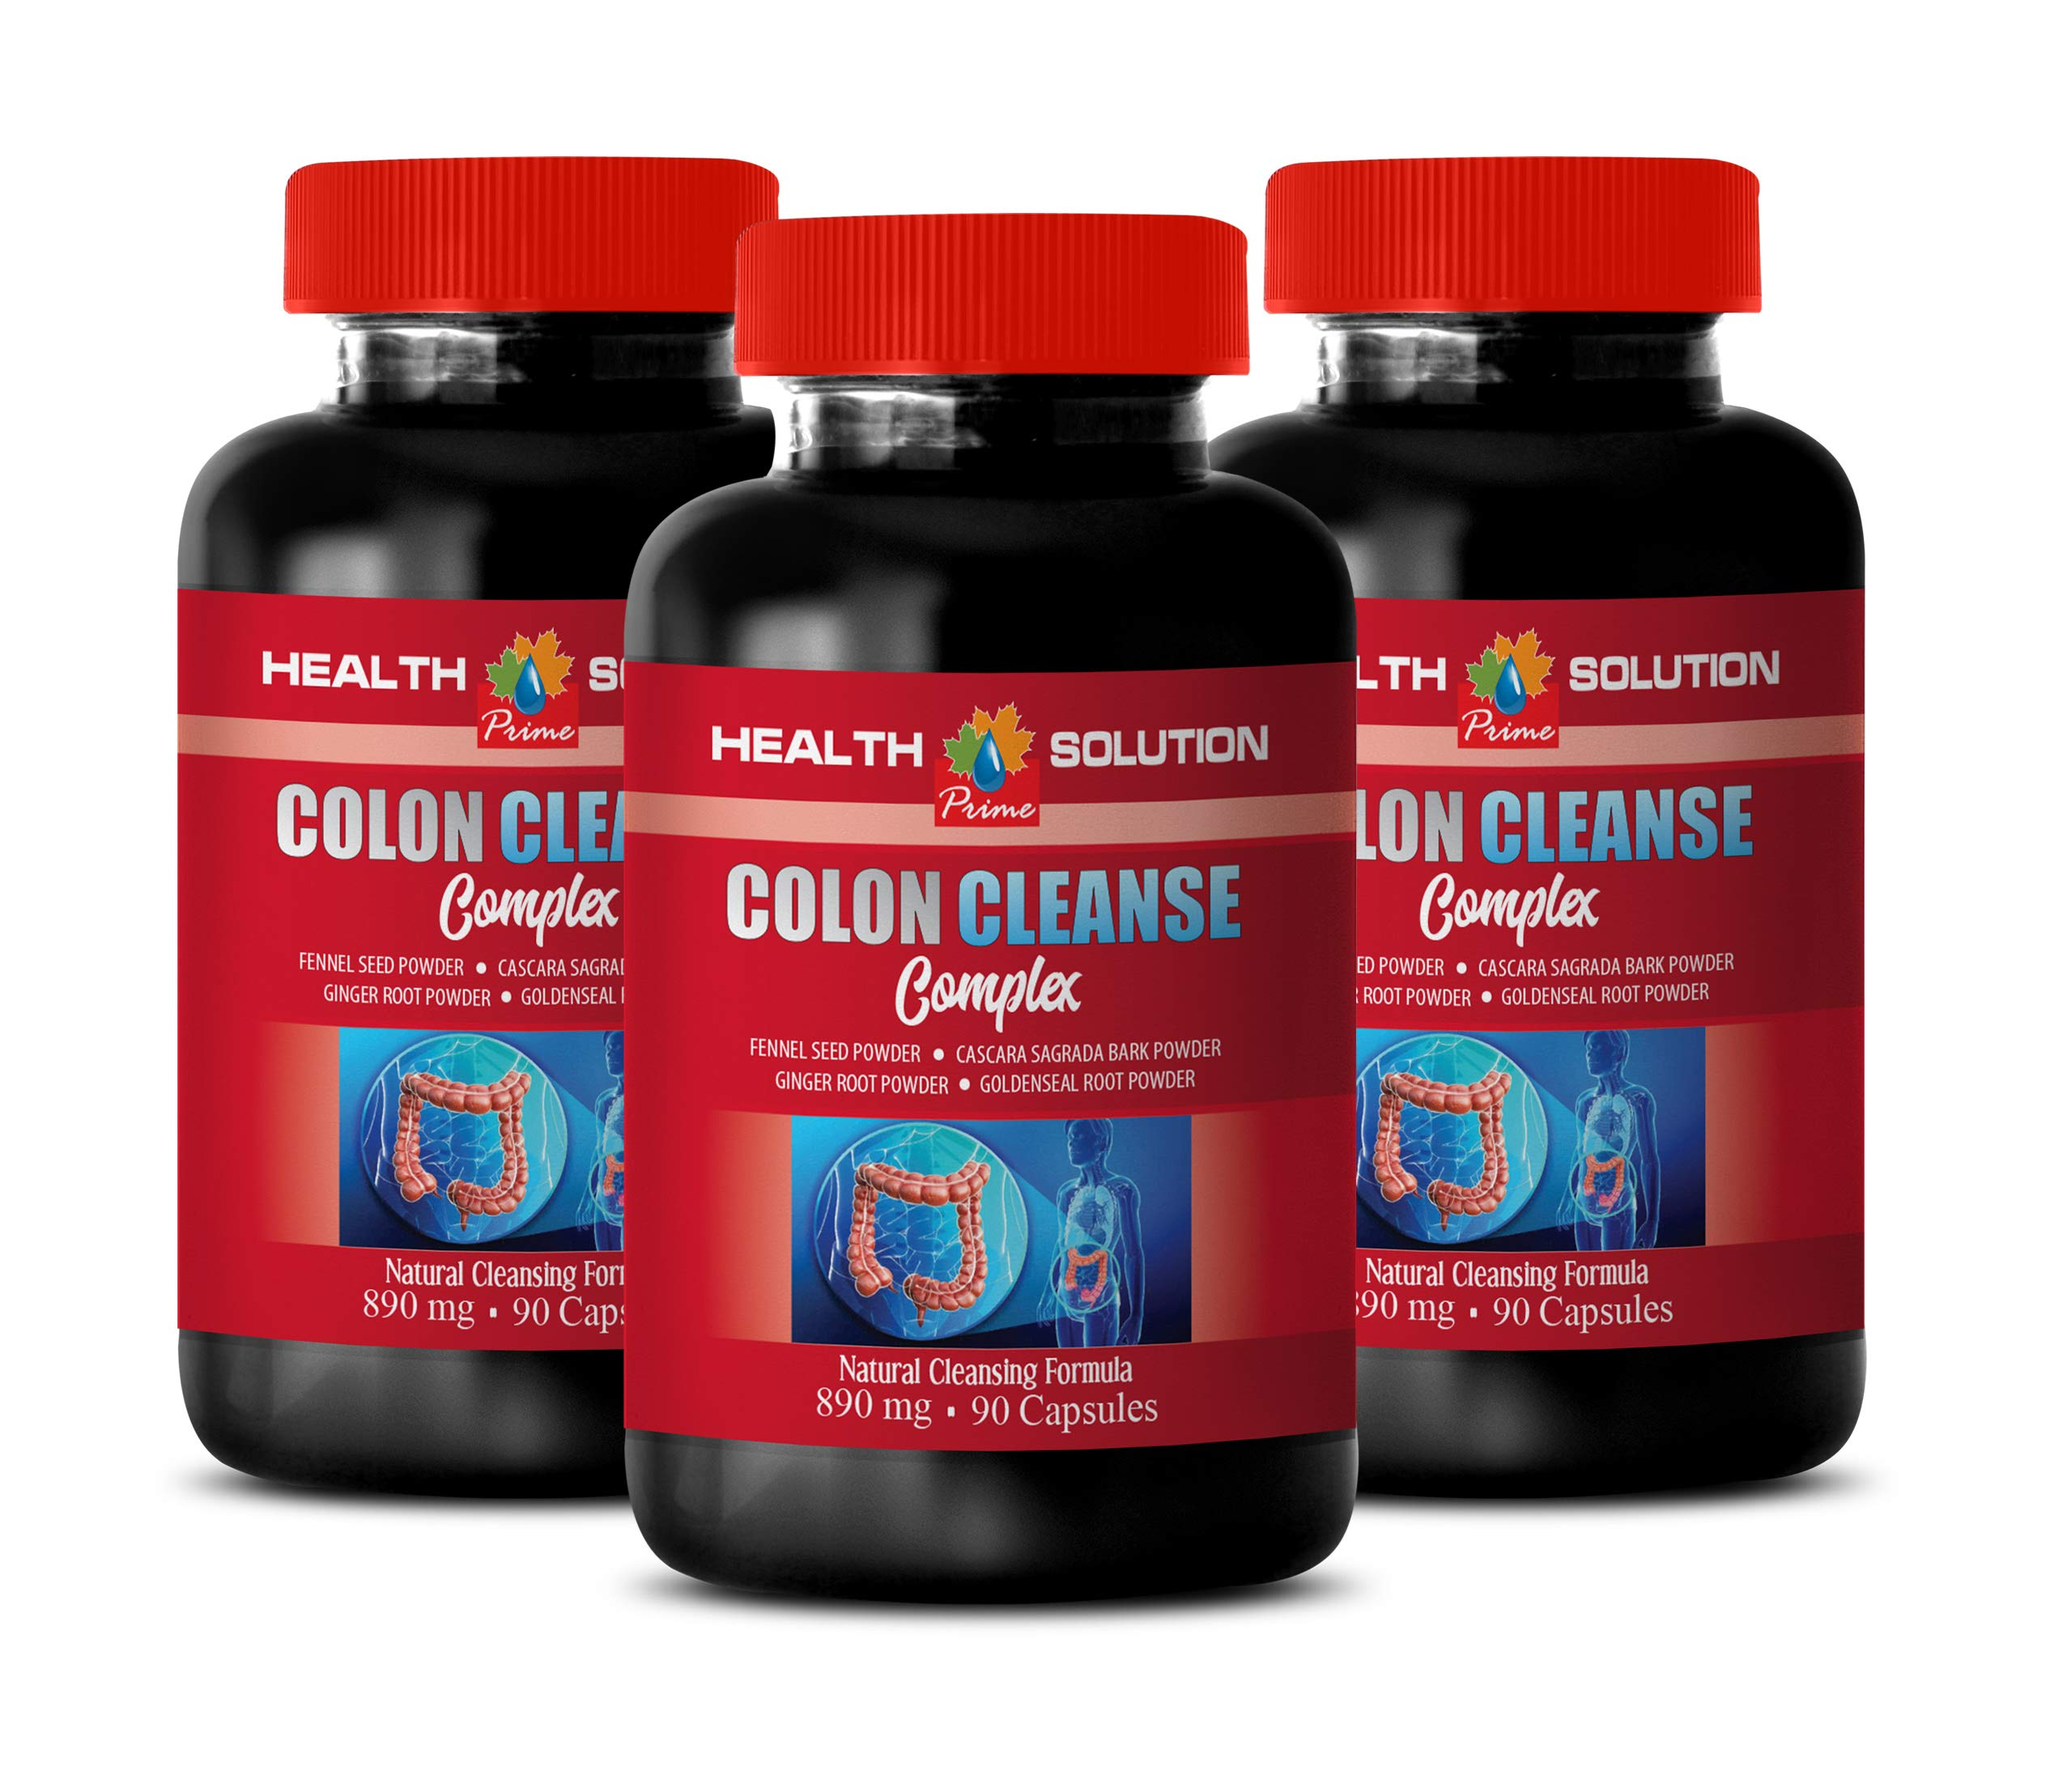 Colon Cleanse Best Seller - Colon Cleanse Complex - Licorice Root Pills - 3 Bottles 270 Capsules